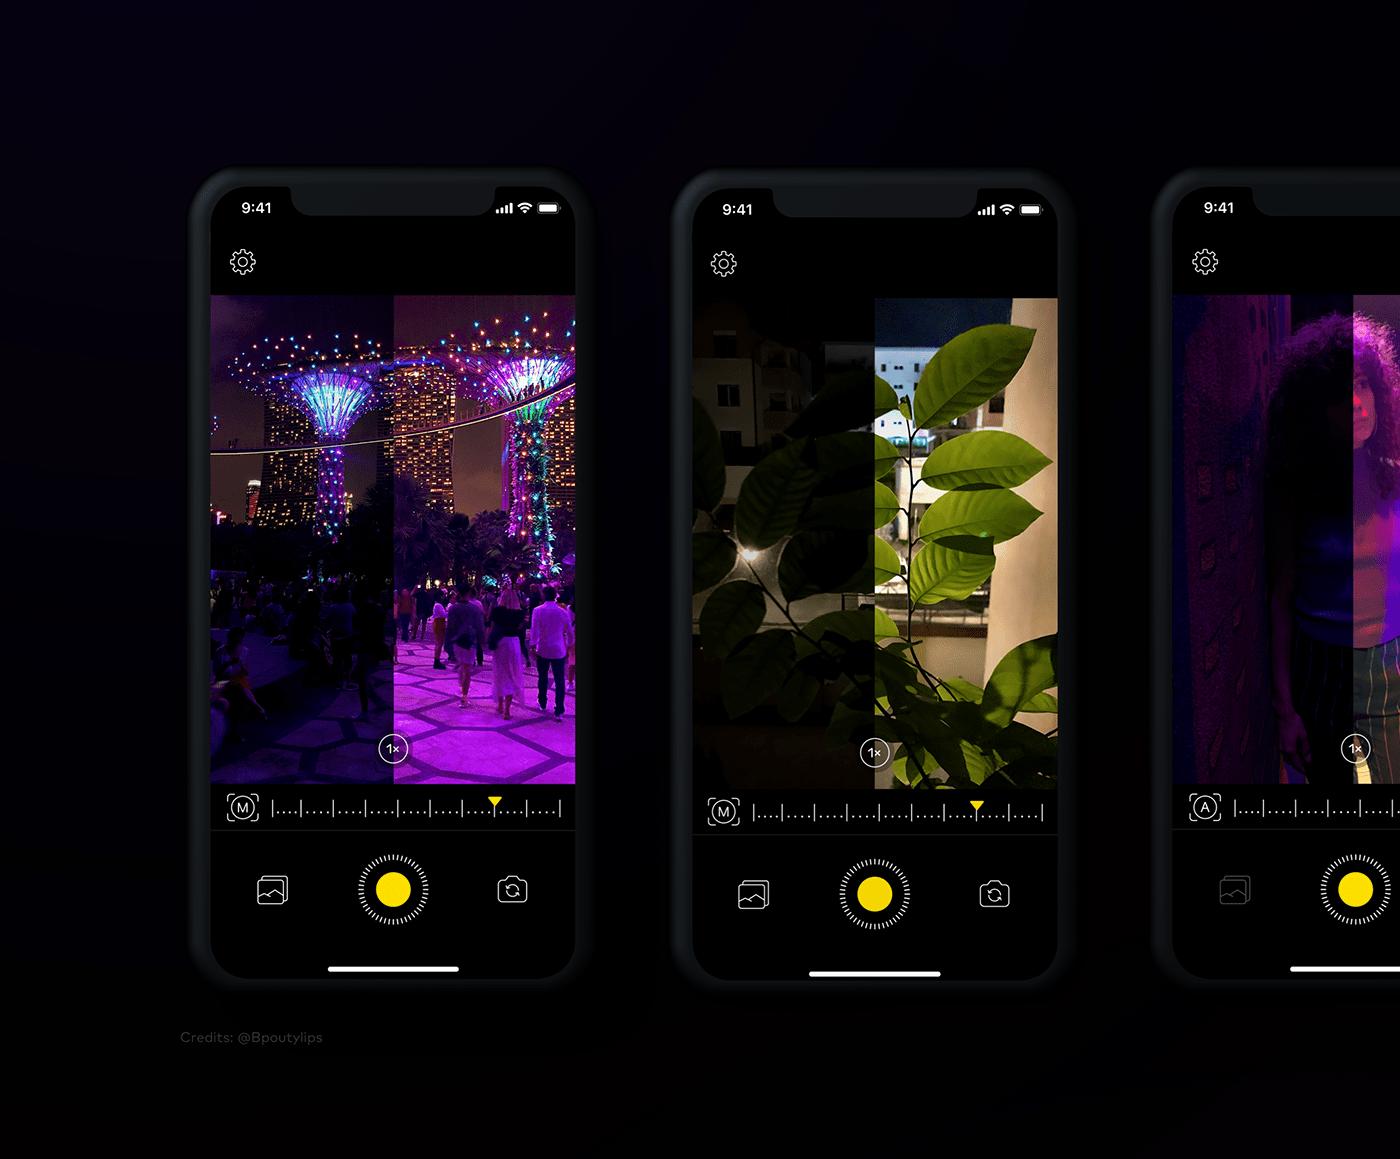 app camera iphone minimal Mobile app mobile design night night mode photocraphy UI/UX